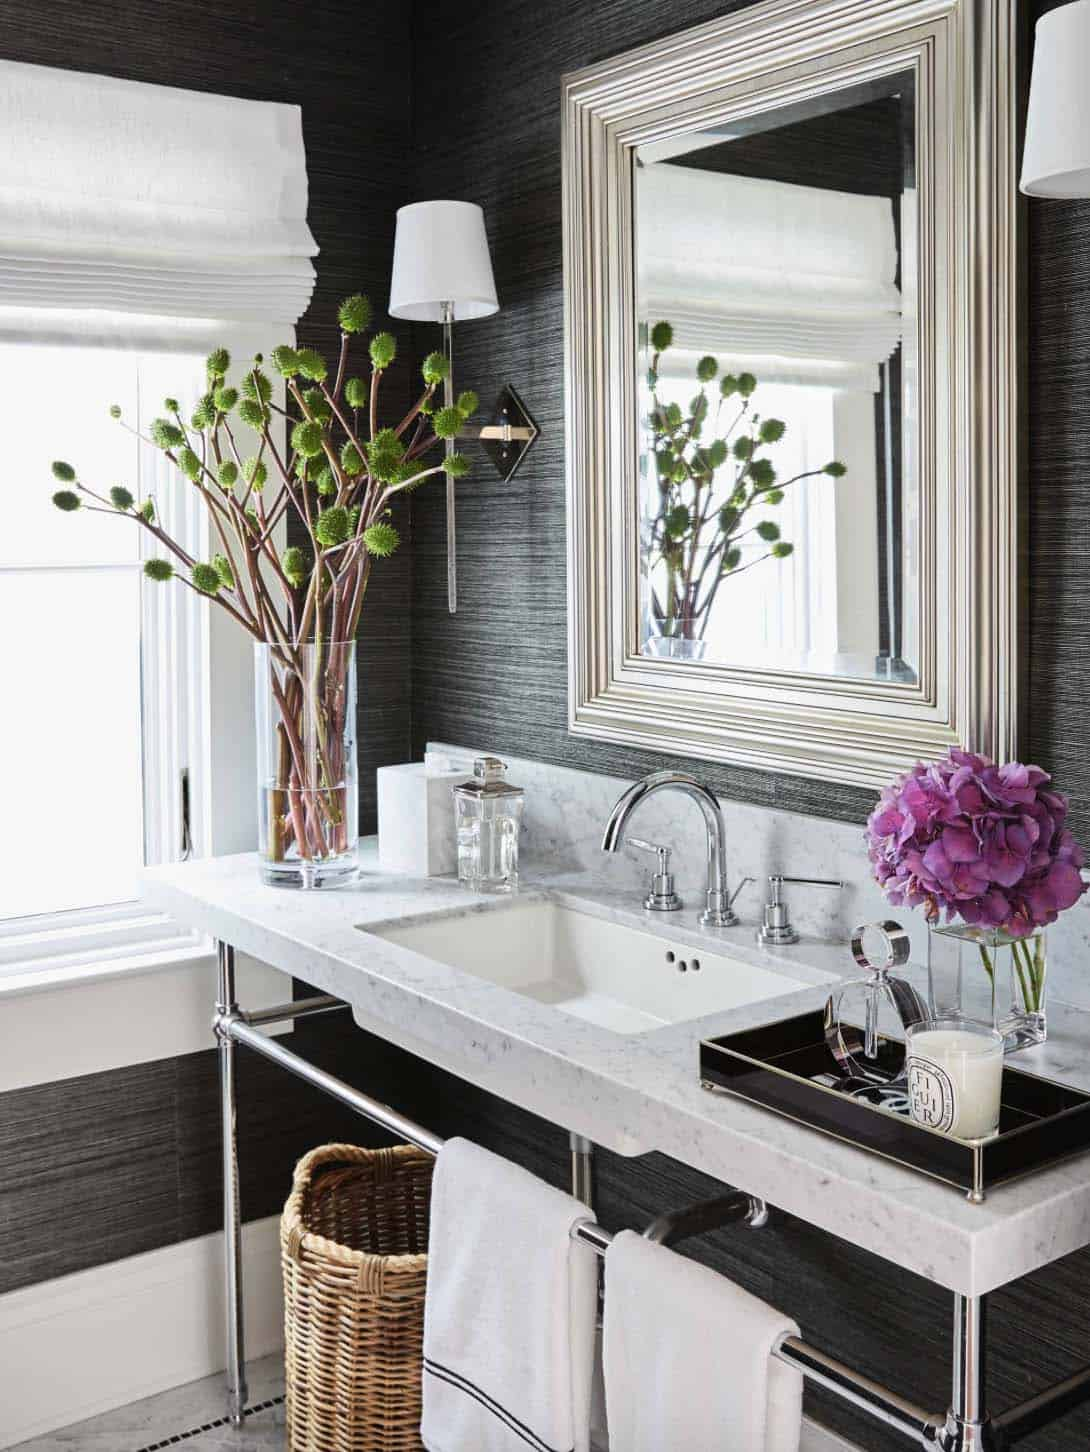 Transitional Style Home-Urrutia Design-23-1 Kindesign